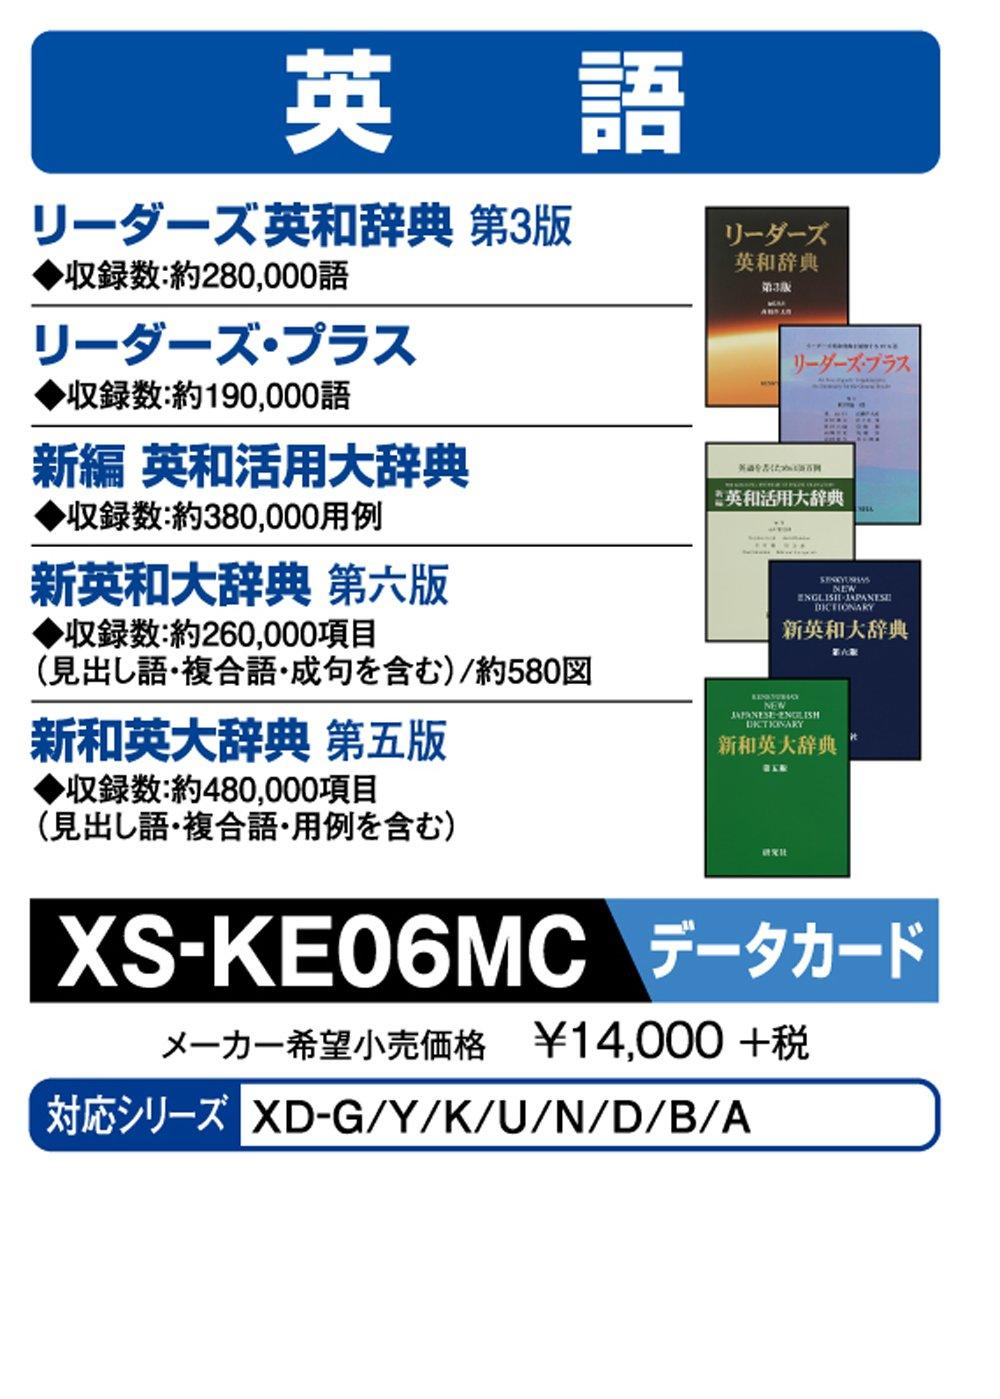 Casio electronic dictionary additional content microSD card version new English-Japanese ShinKazuhide unabridged Leaders English-Japanese Dictionary Leaders plus Shinpen English-Japanese leverage large dictionary XS-KE06MC